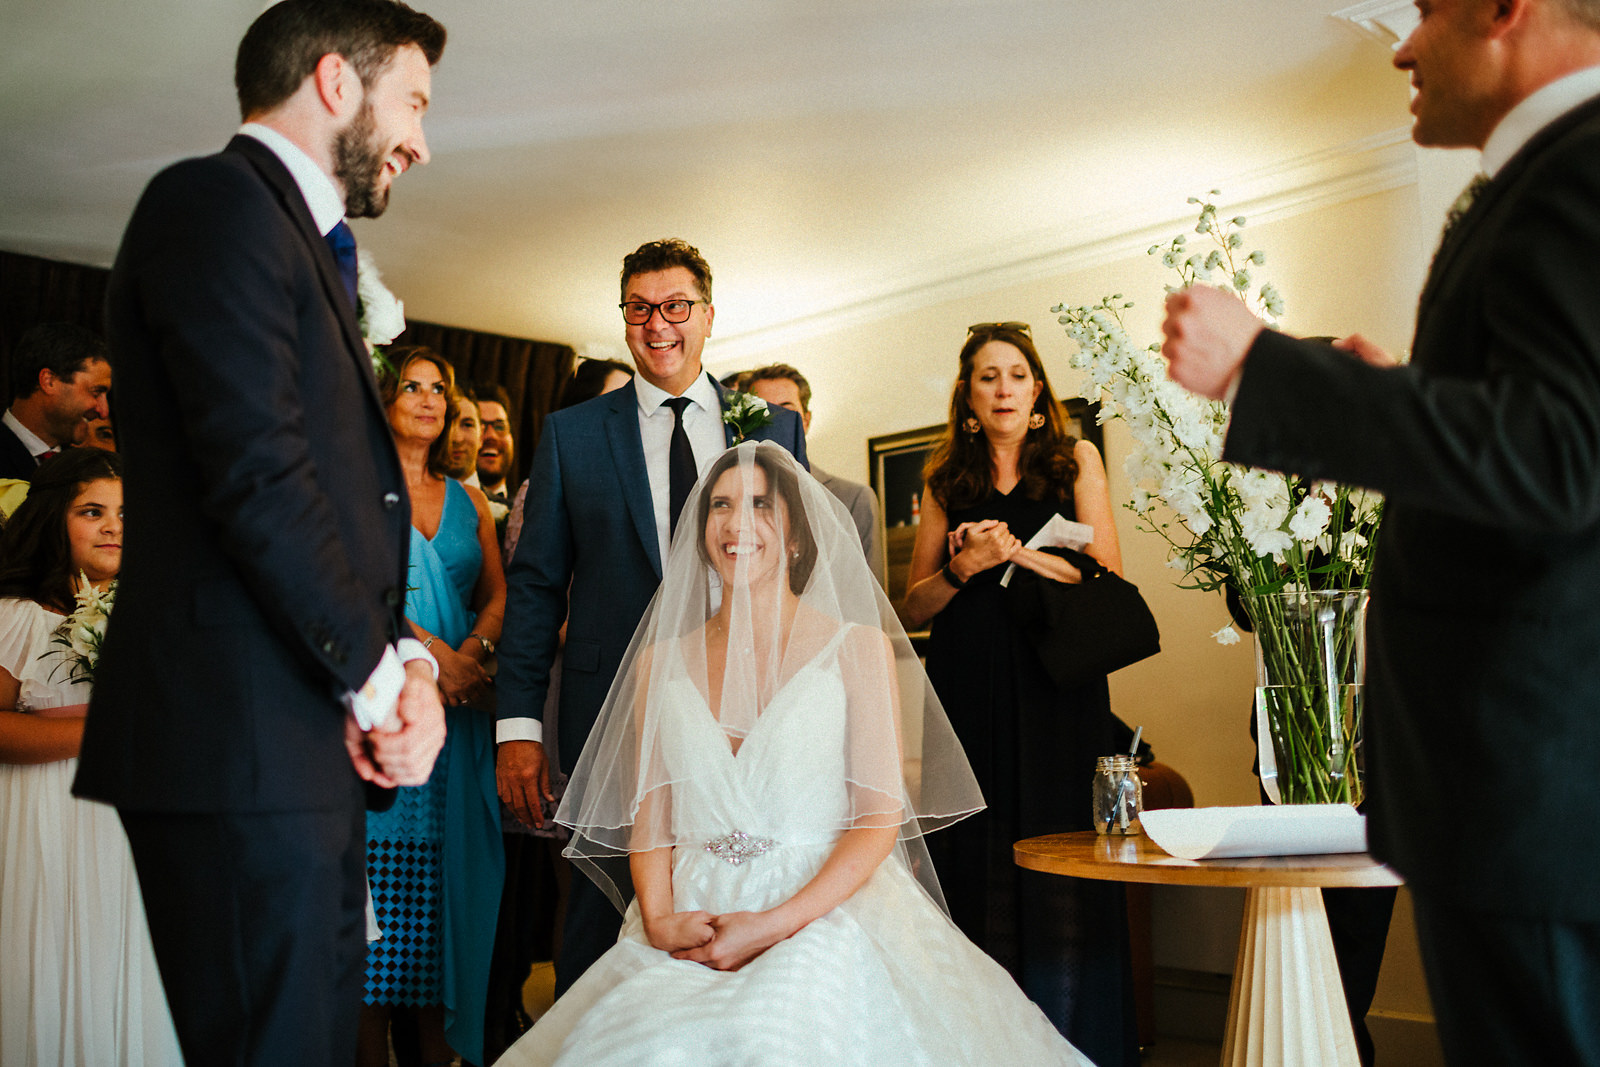 The veil ceremony at Jewish wedding in Essex